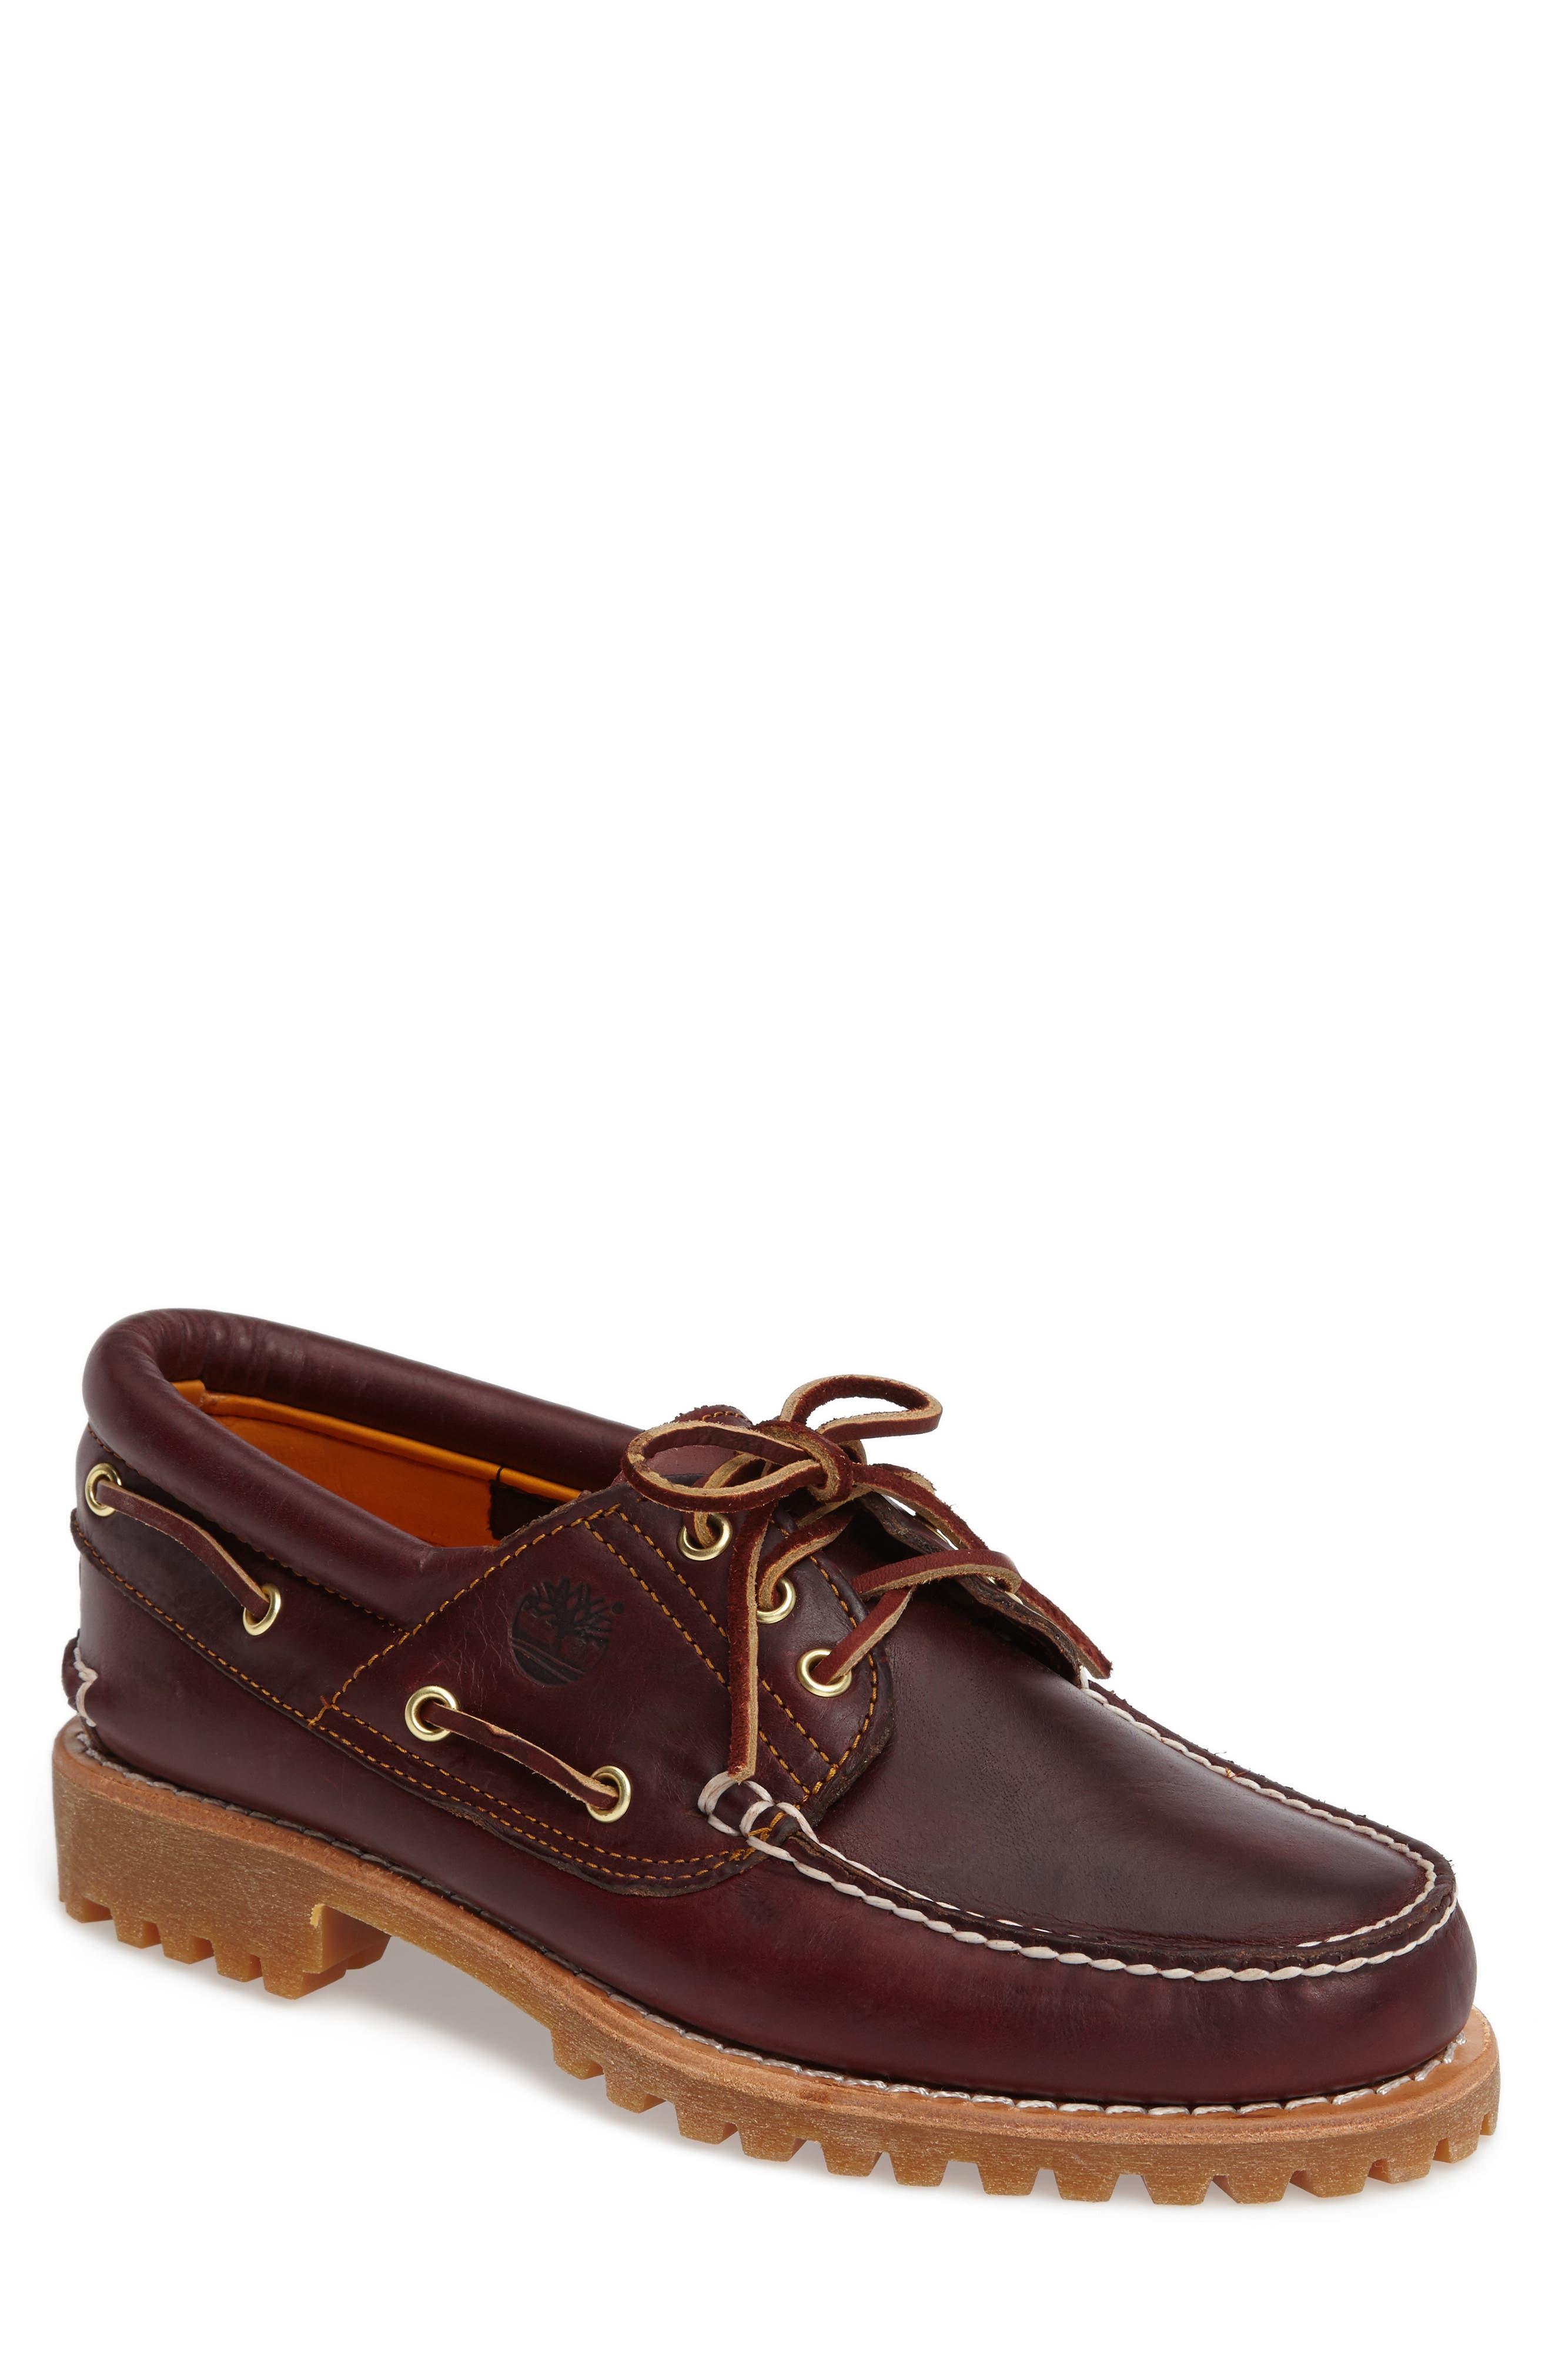 Main Image - Timberland Authentic Boat Shoe (Men)